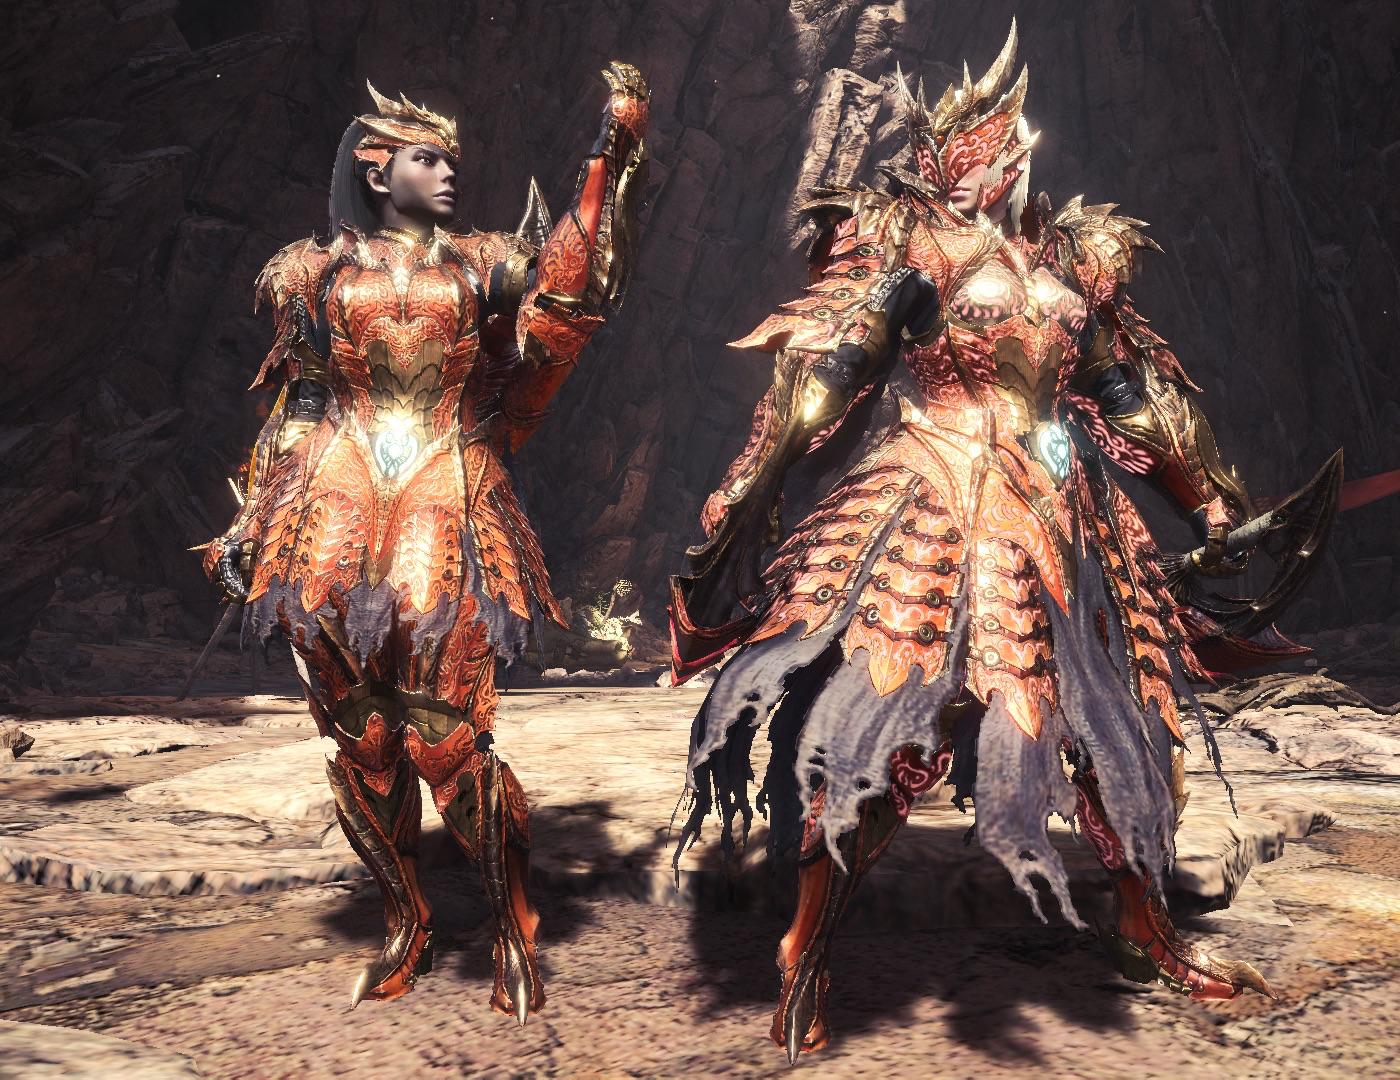 Mhw Iceborne Safi Jiiva Armor Sets Skills Gamewith